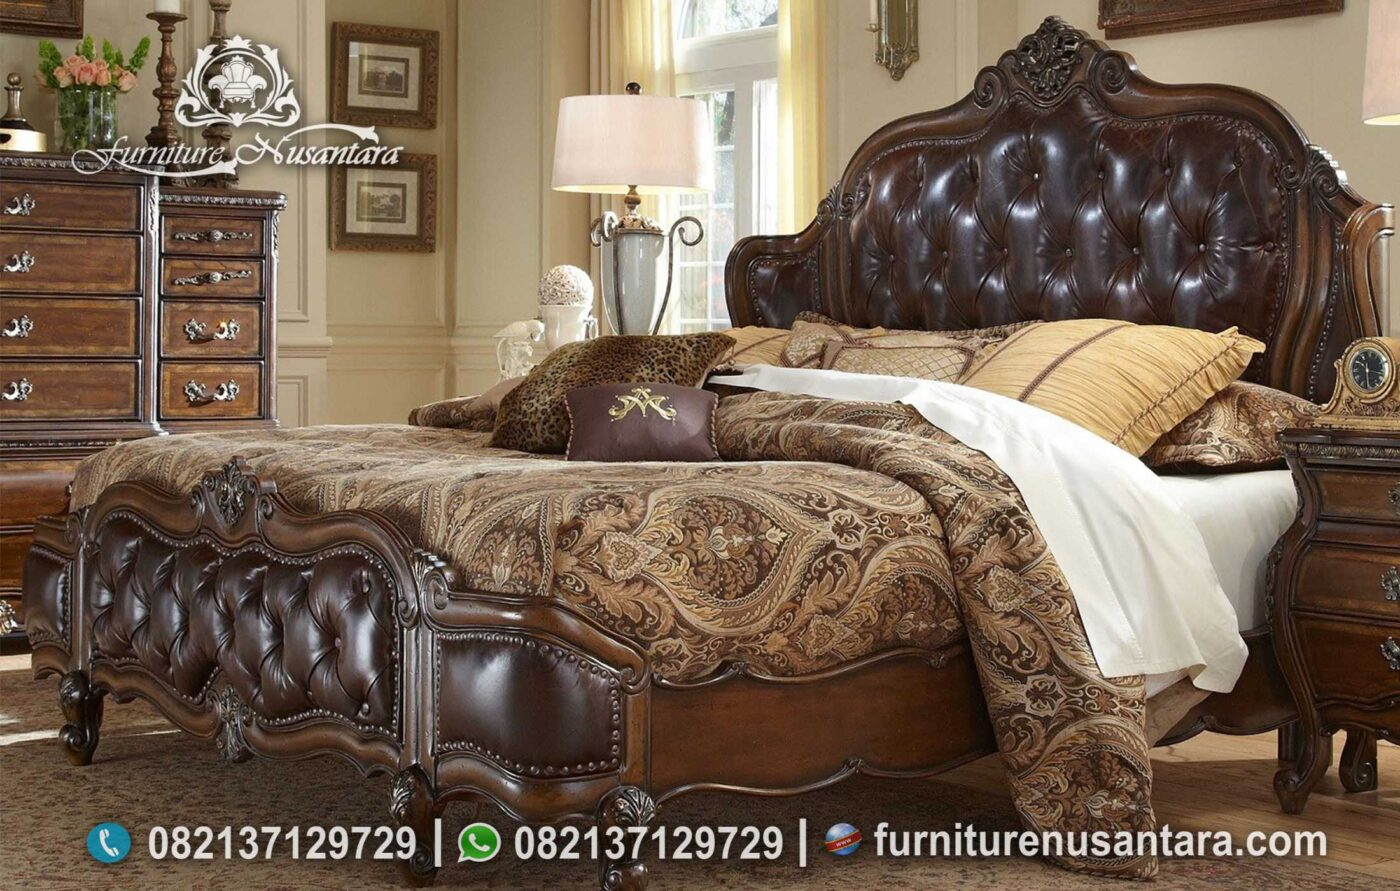 Model Tempat Tidur Antik Kayu Jati KS-252, Furniture Nusantara